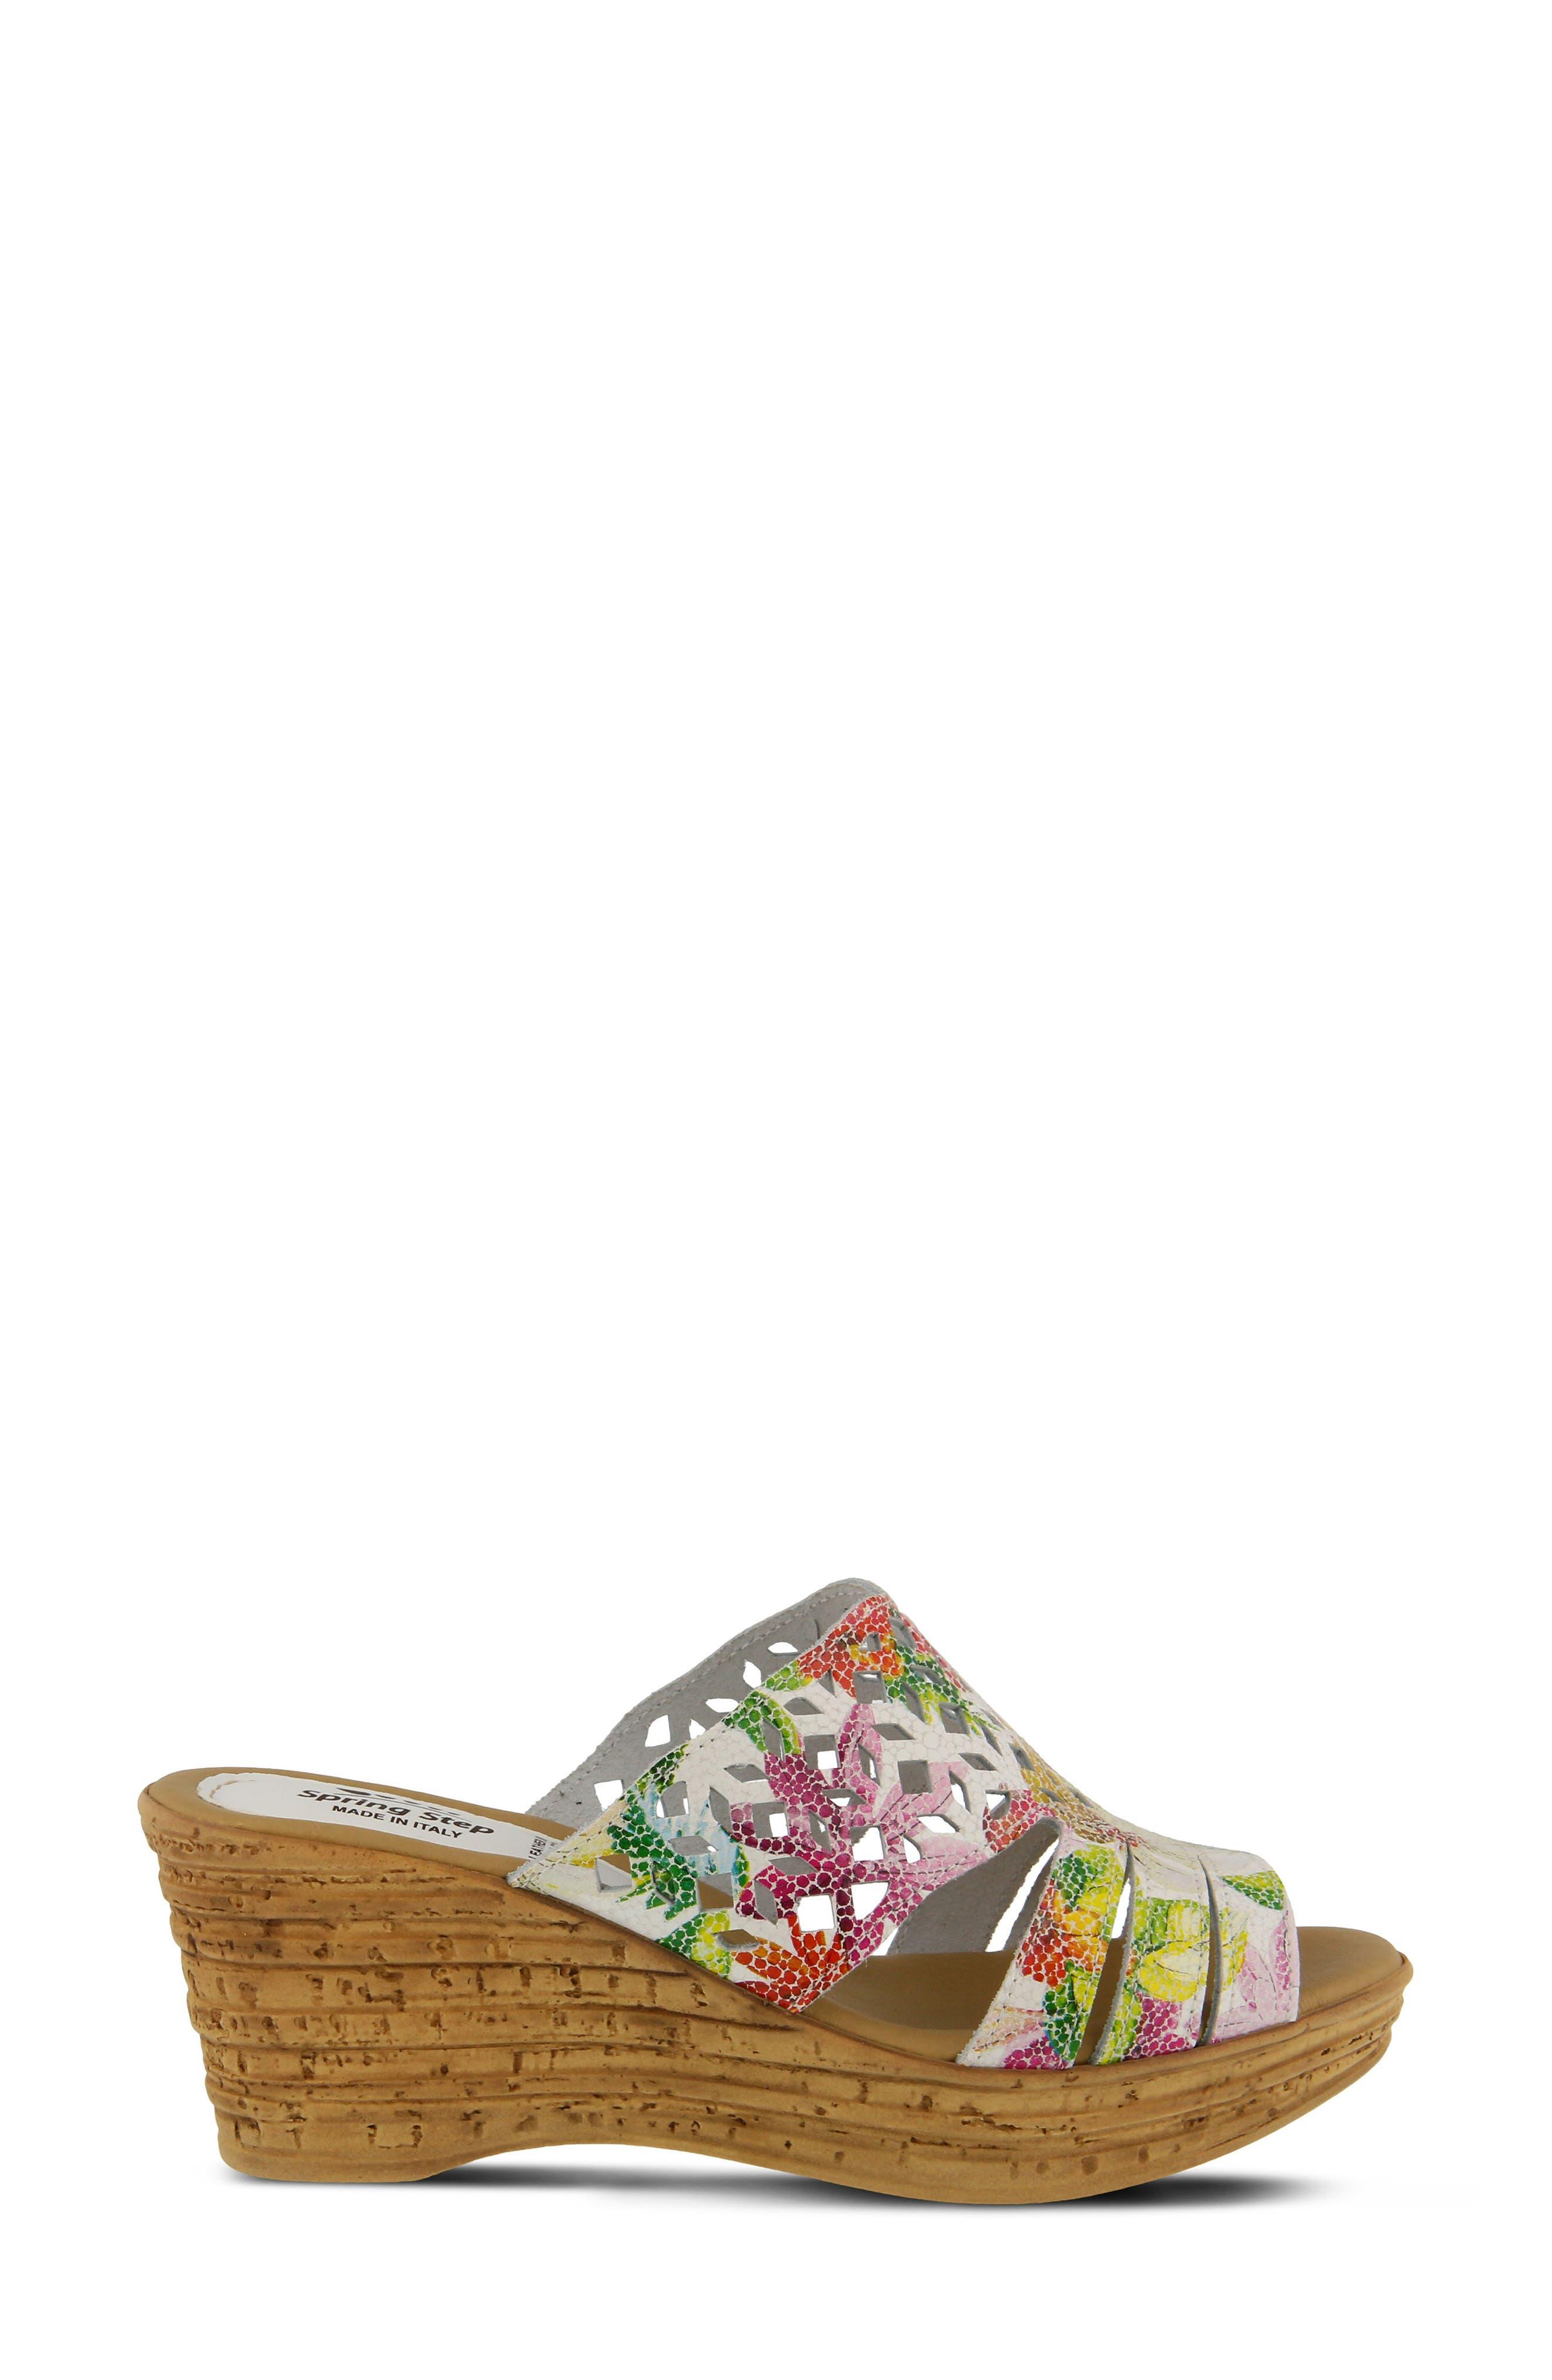 Viniko Platform Wedge Sandal,                             Alternate thumbnail 3, color,                             White Leather